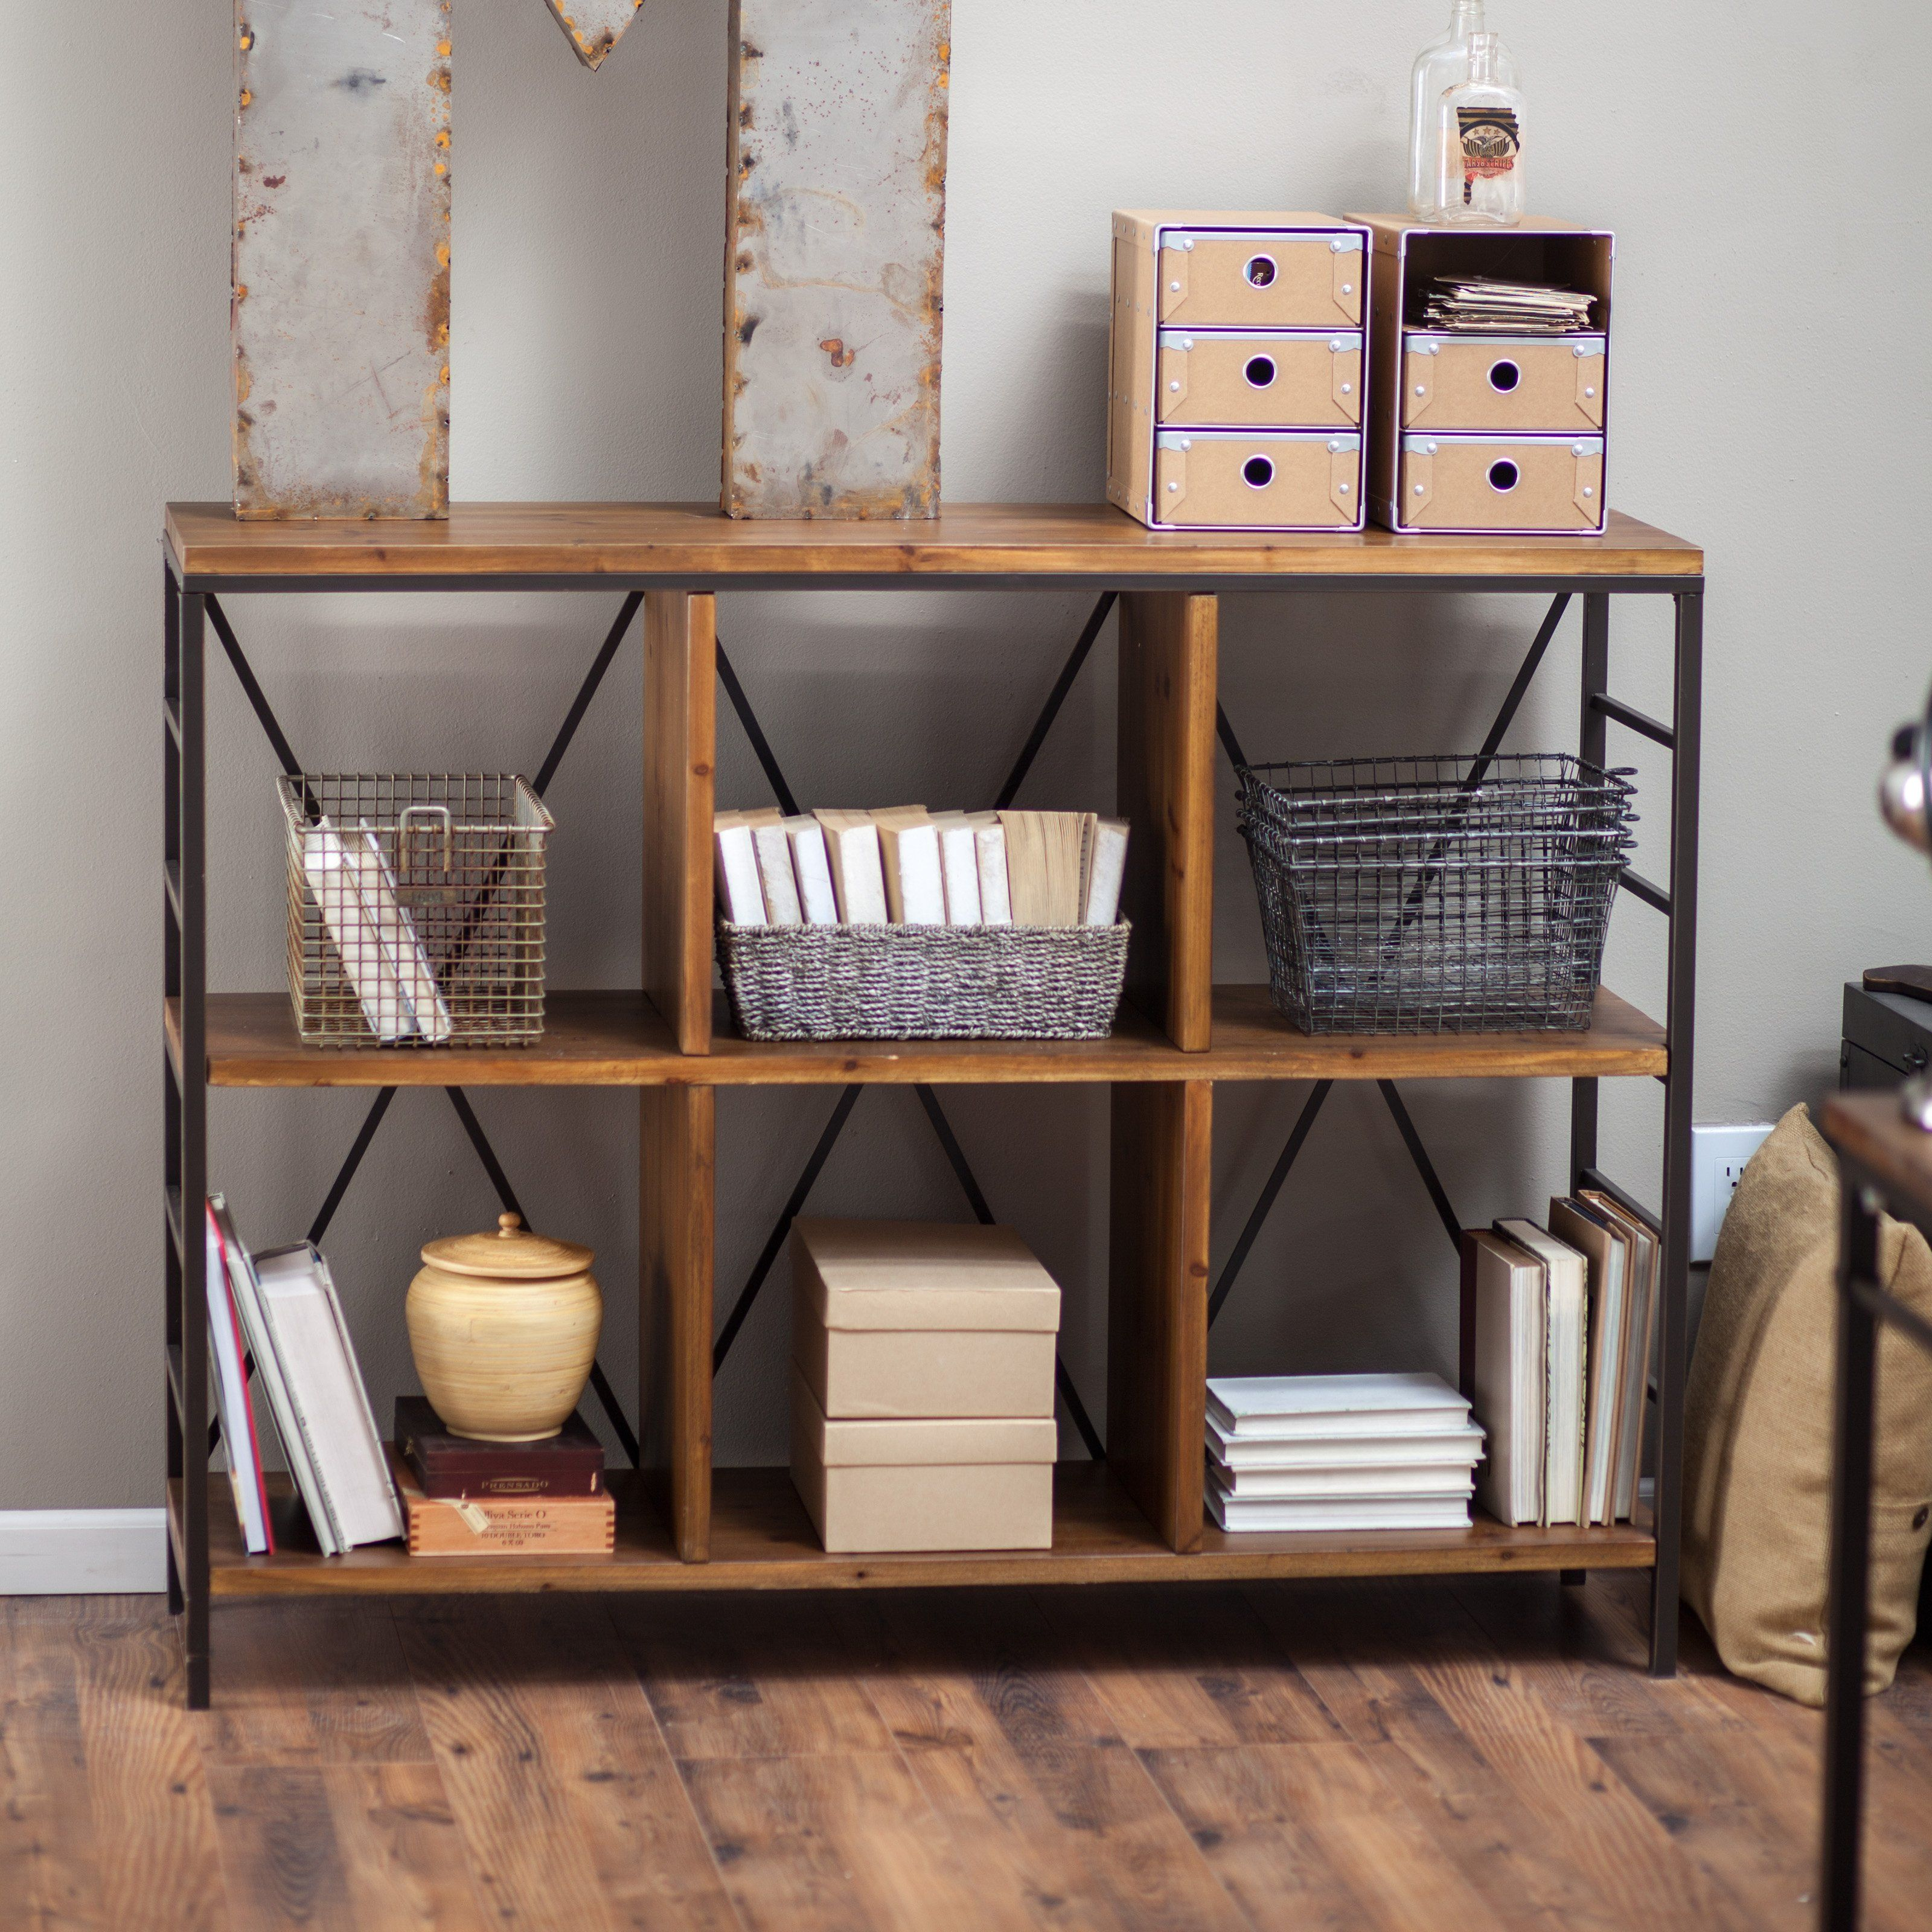 Belham Living Townsend 6 Cube Bookcase